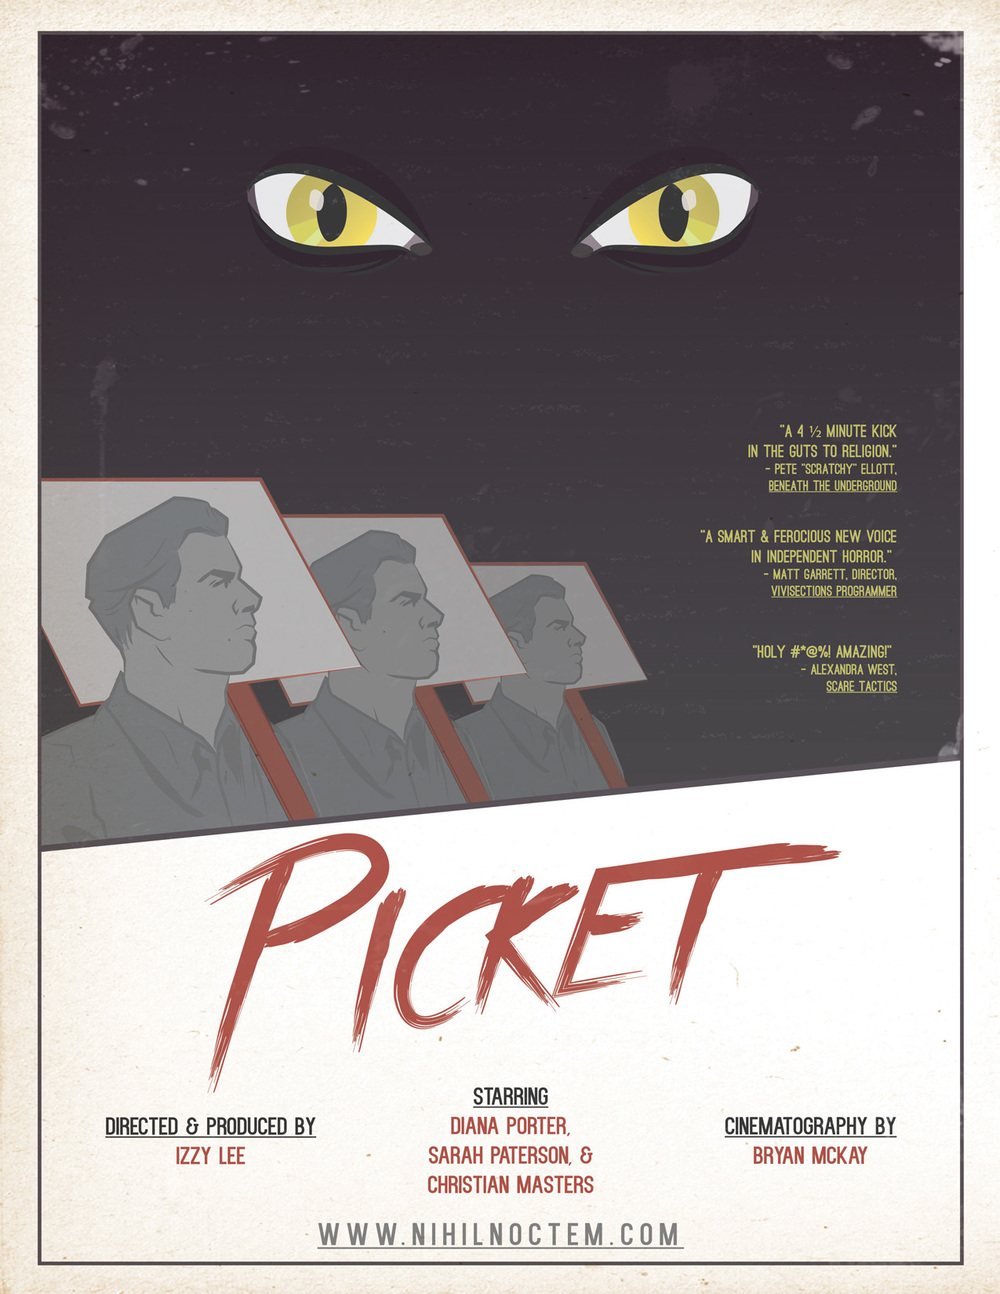 Picket_8.5x11_Poster-01.jpg